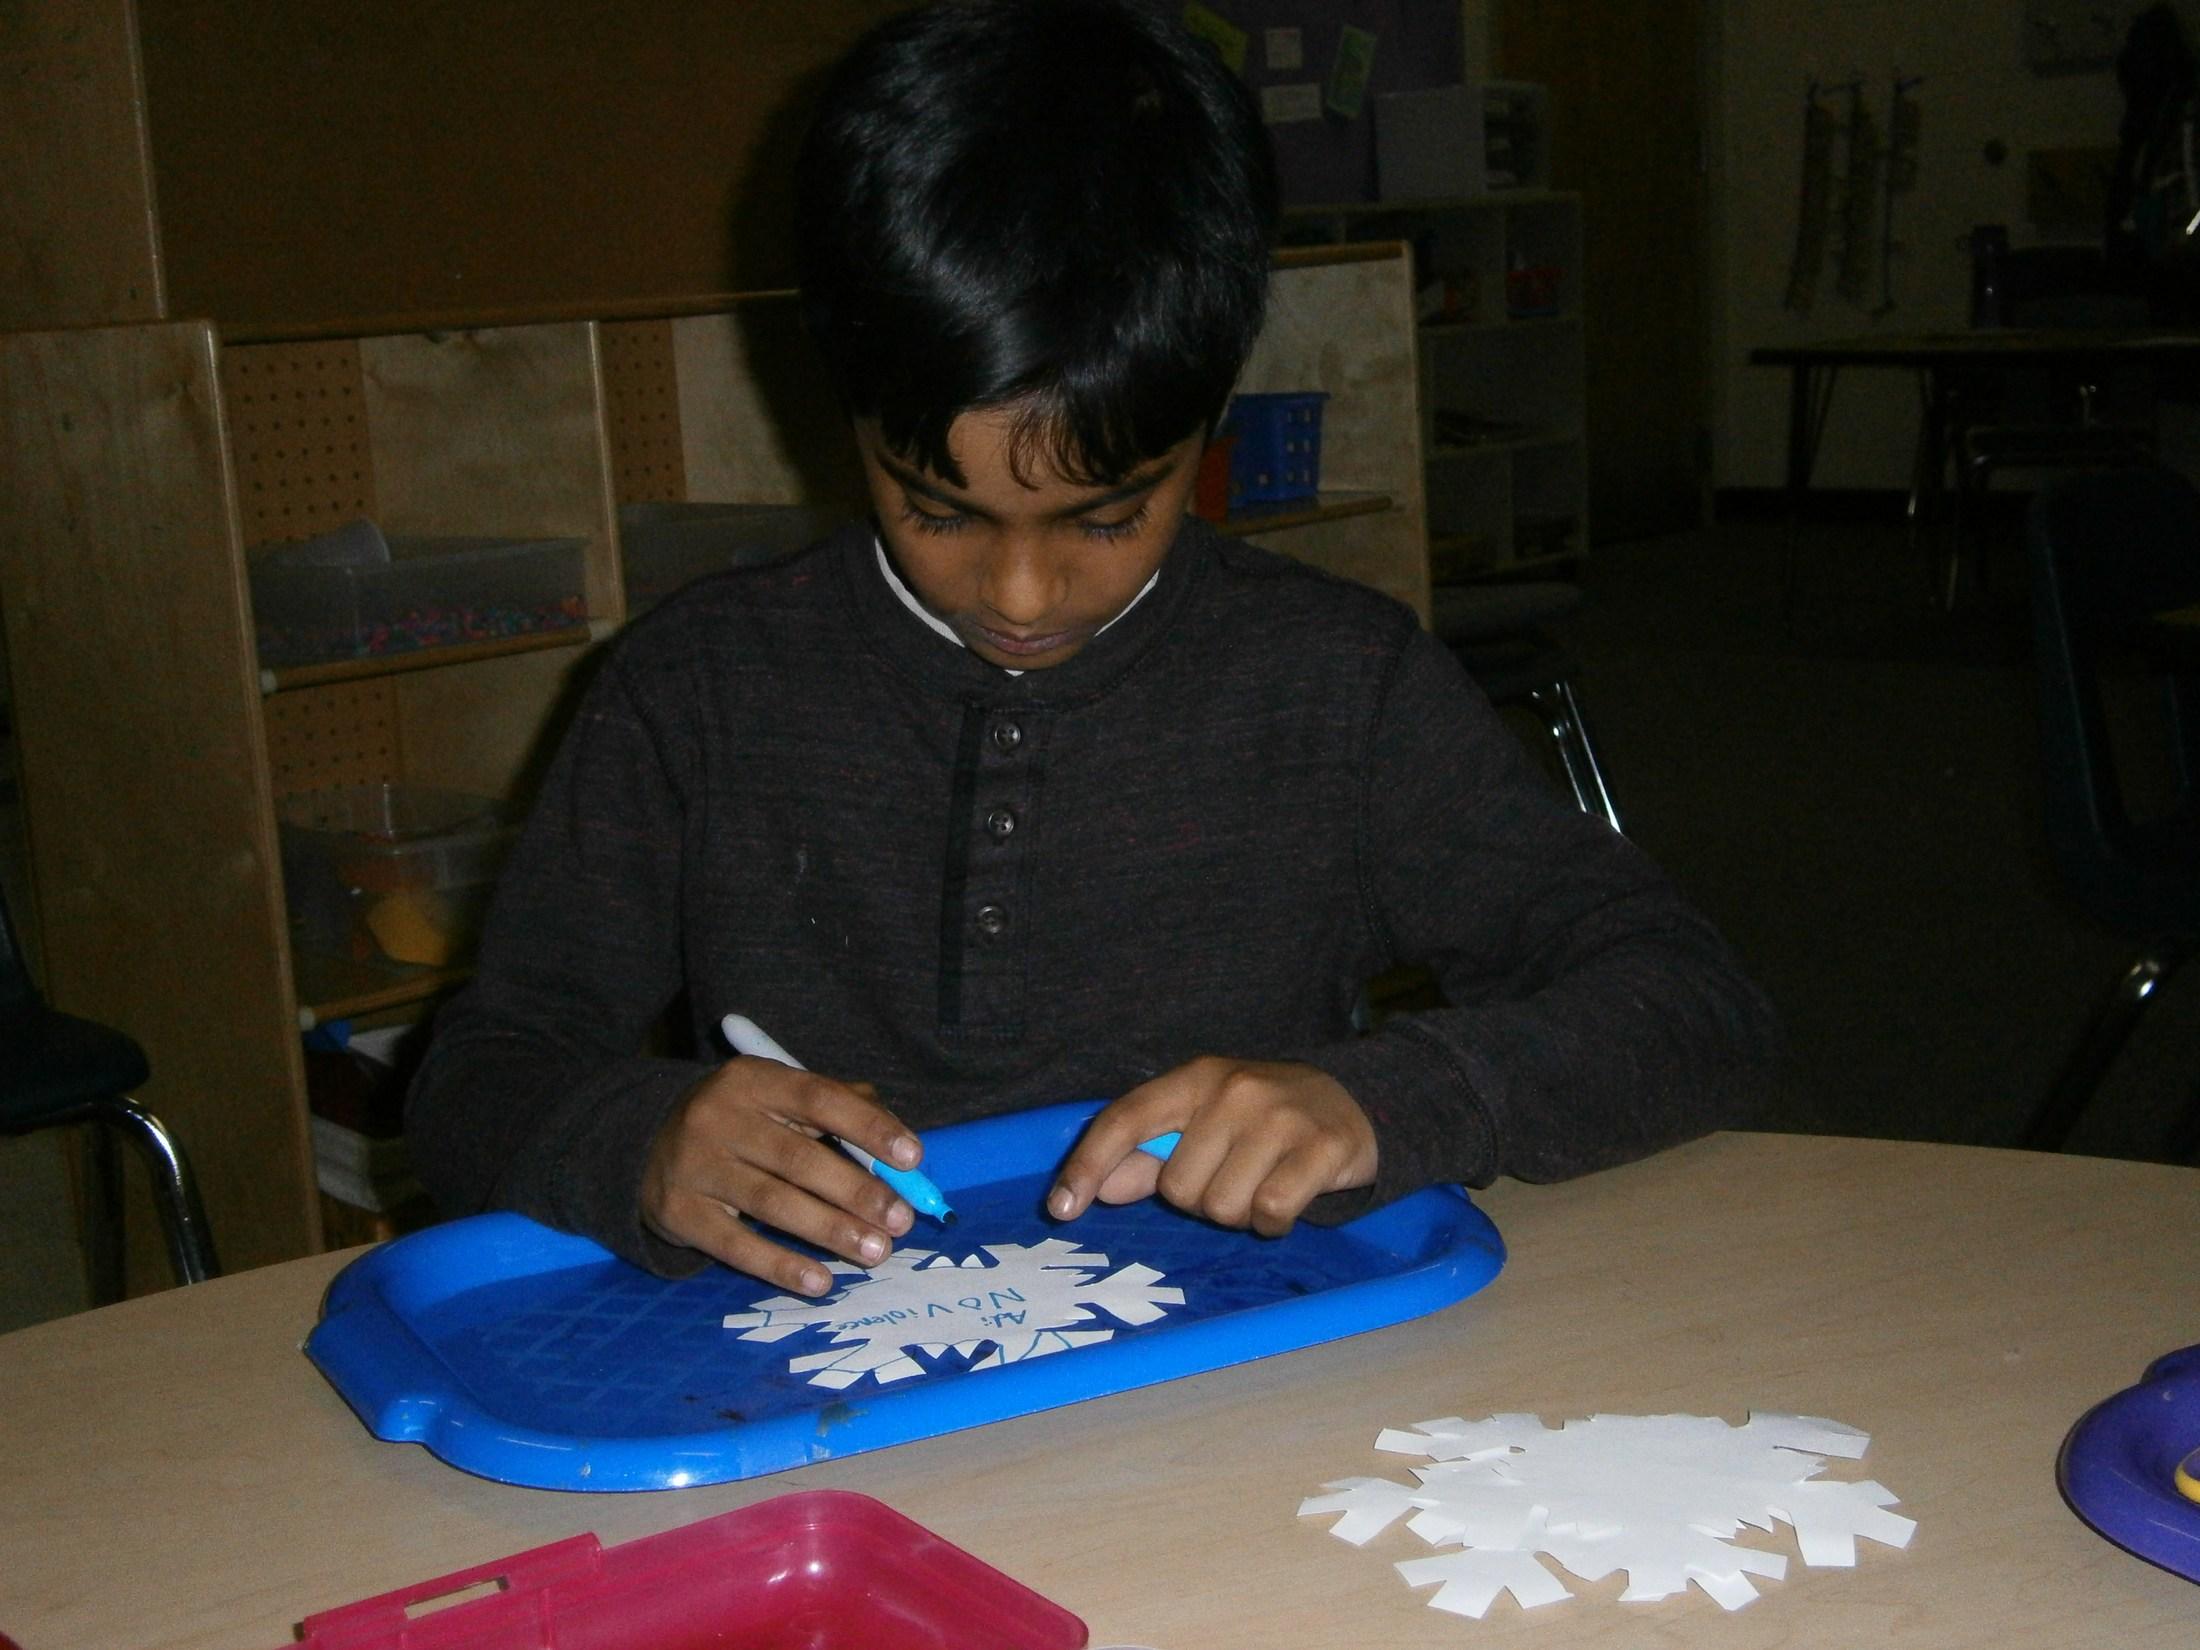 Writing on a snowflake.